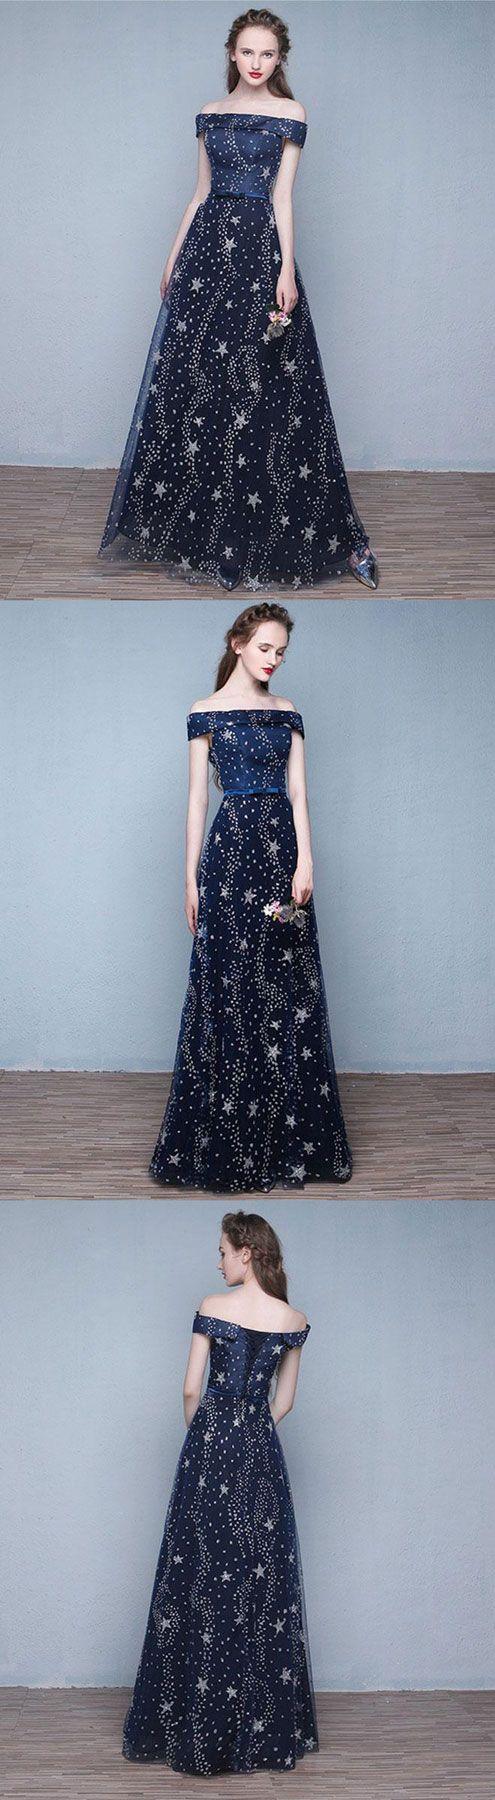 Blue long prom dress off shoulder evening dress long prom dresses